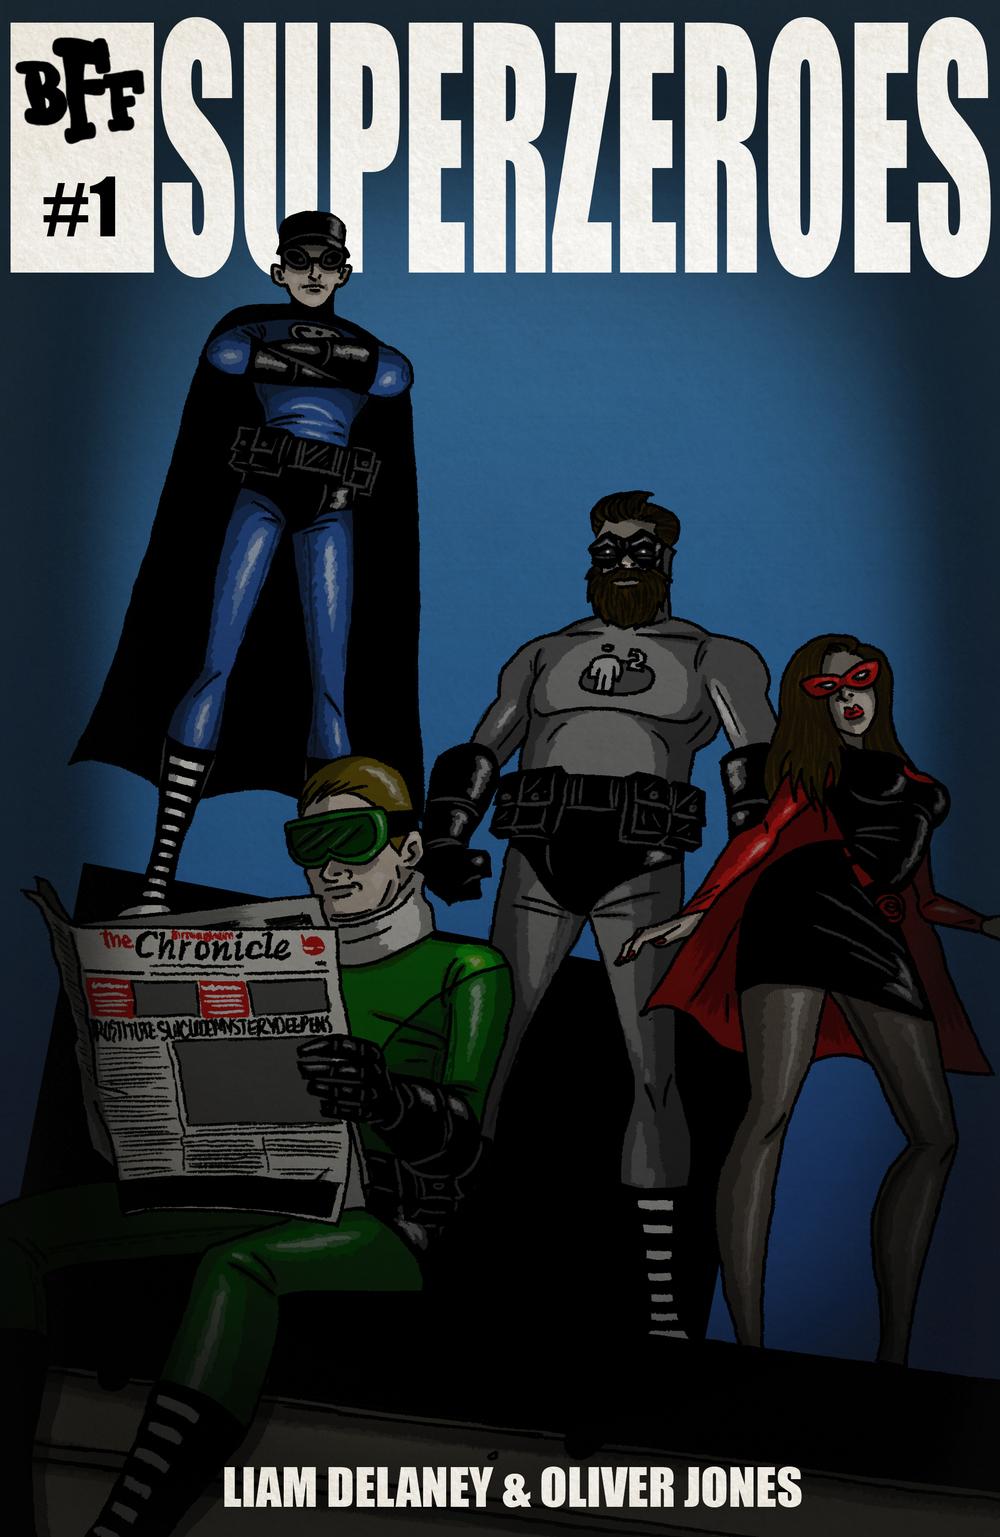 comic cover.jpg